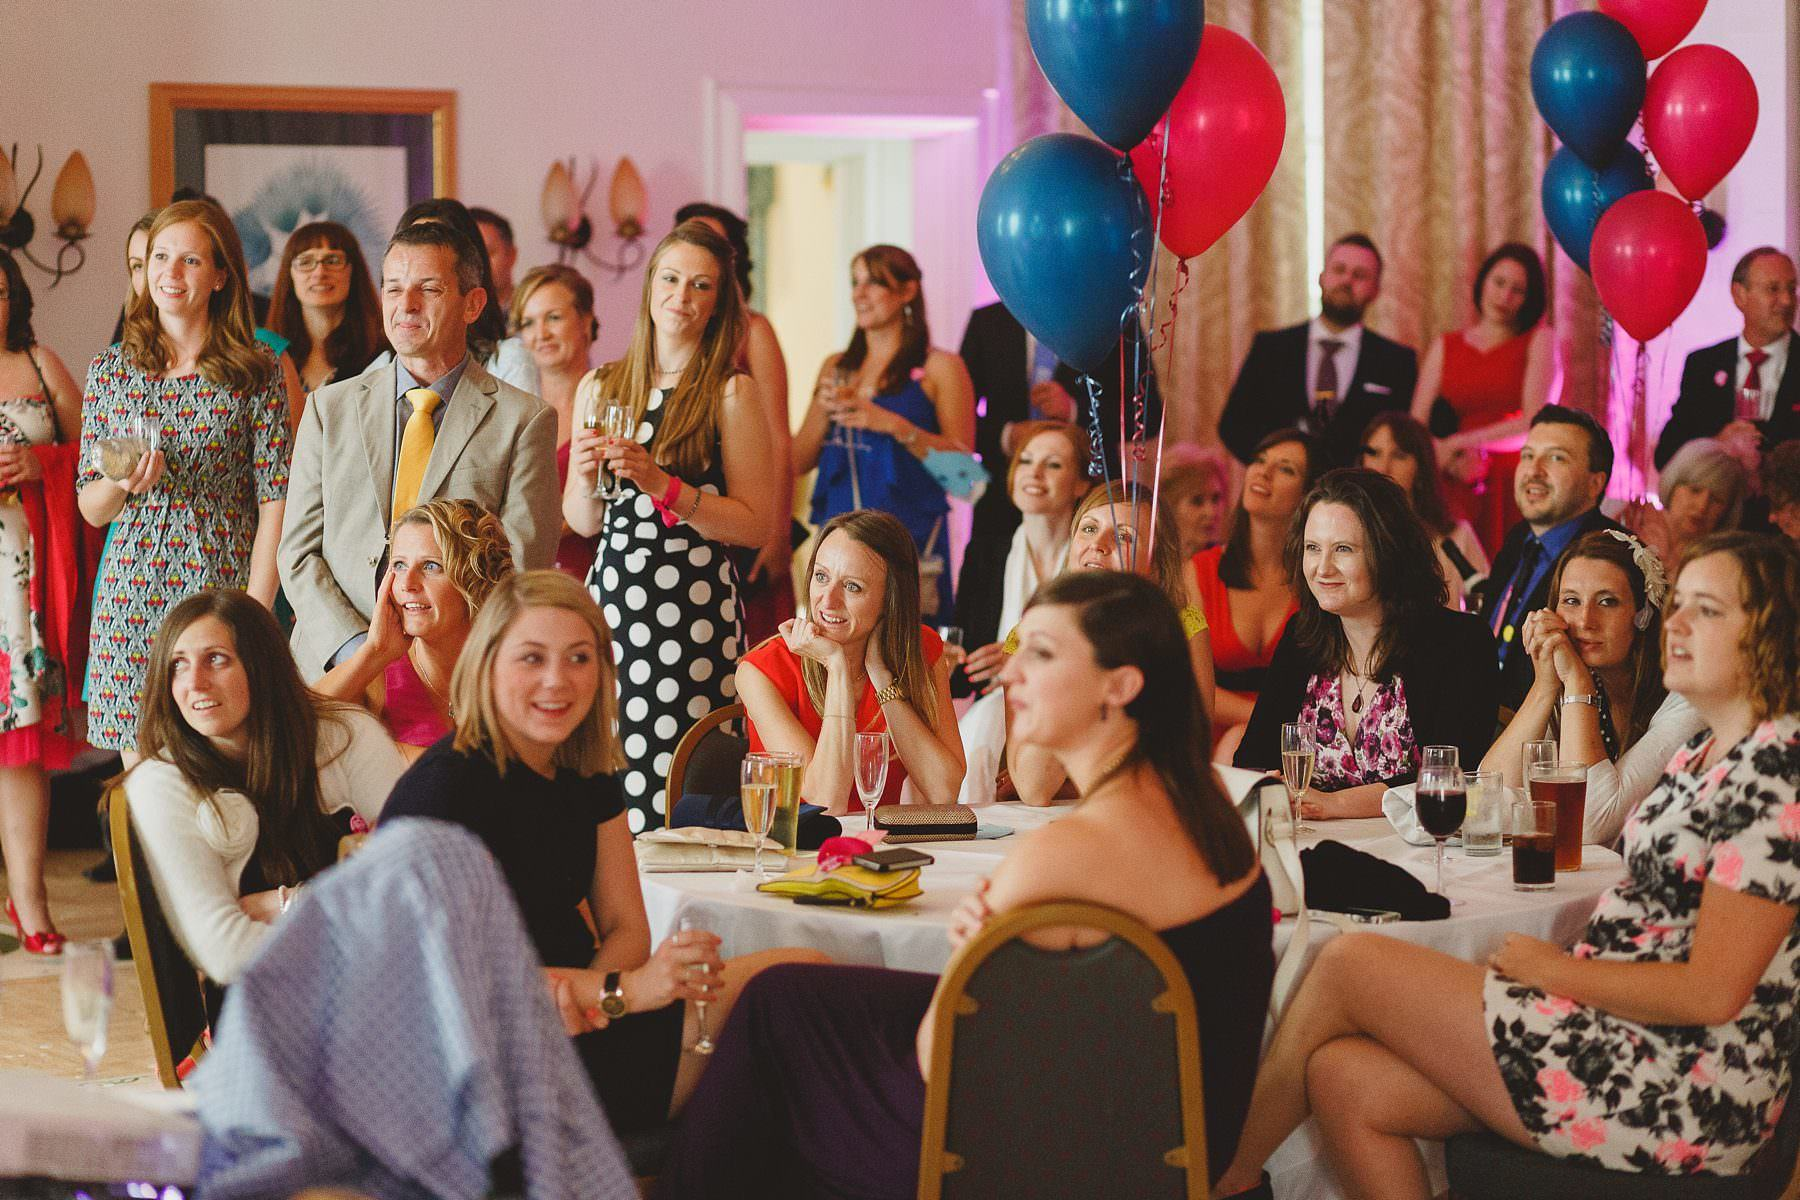 weddings-at-bristol-zoo-033